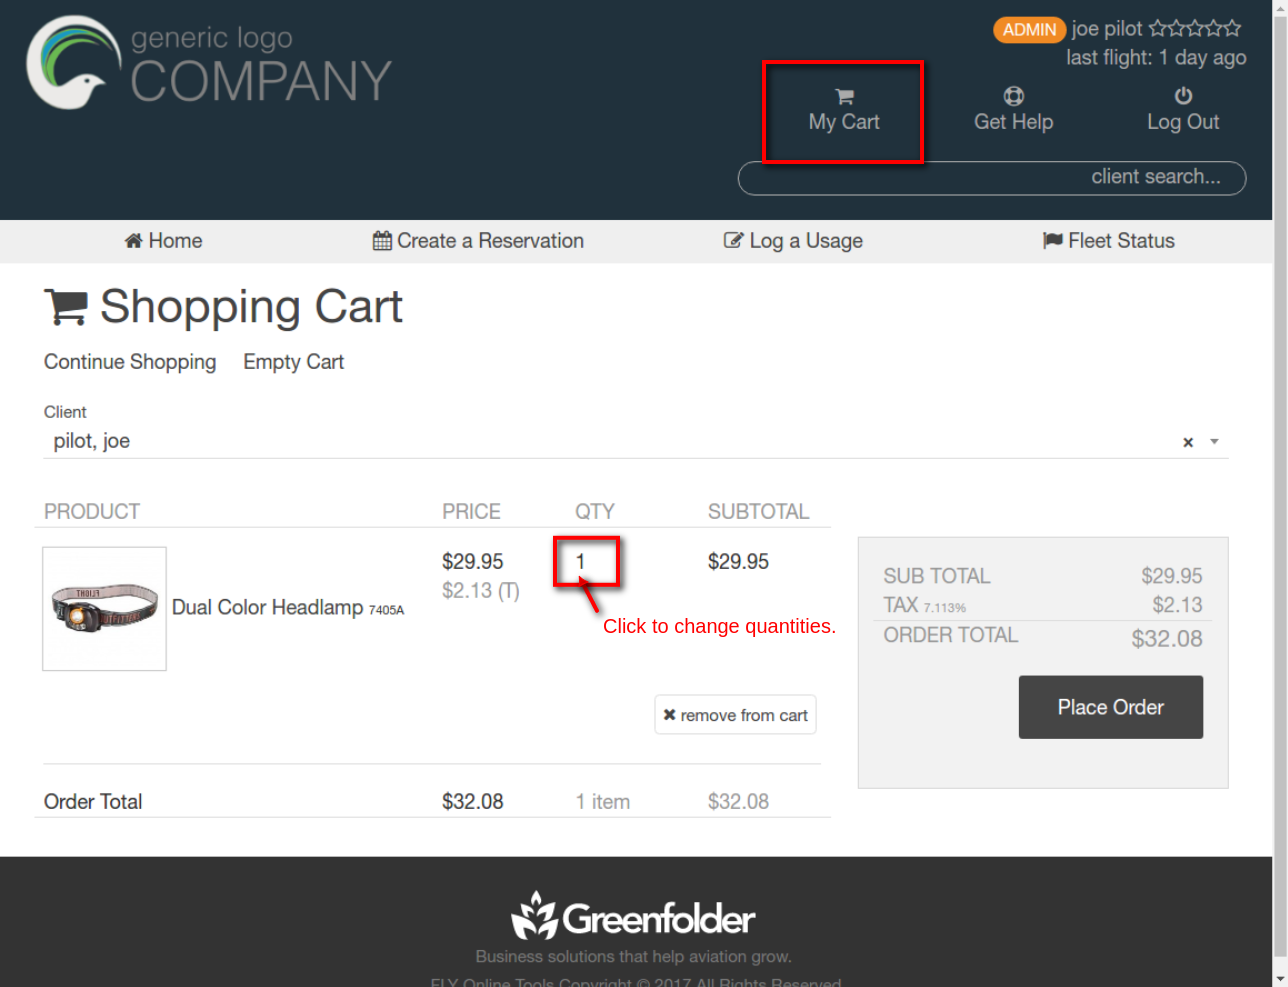 my cart menu link